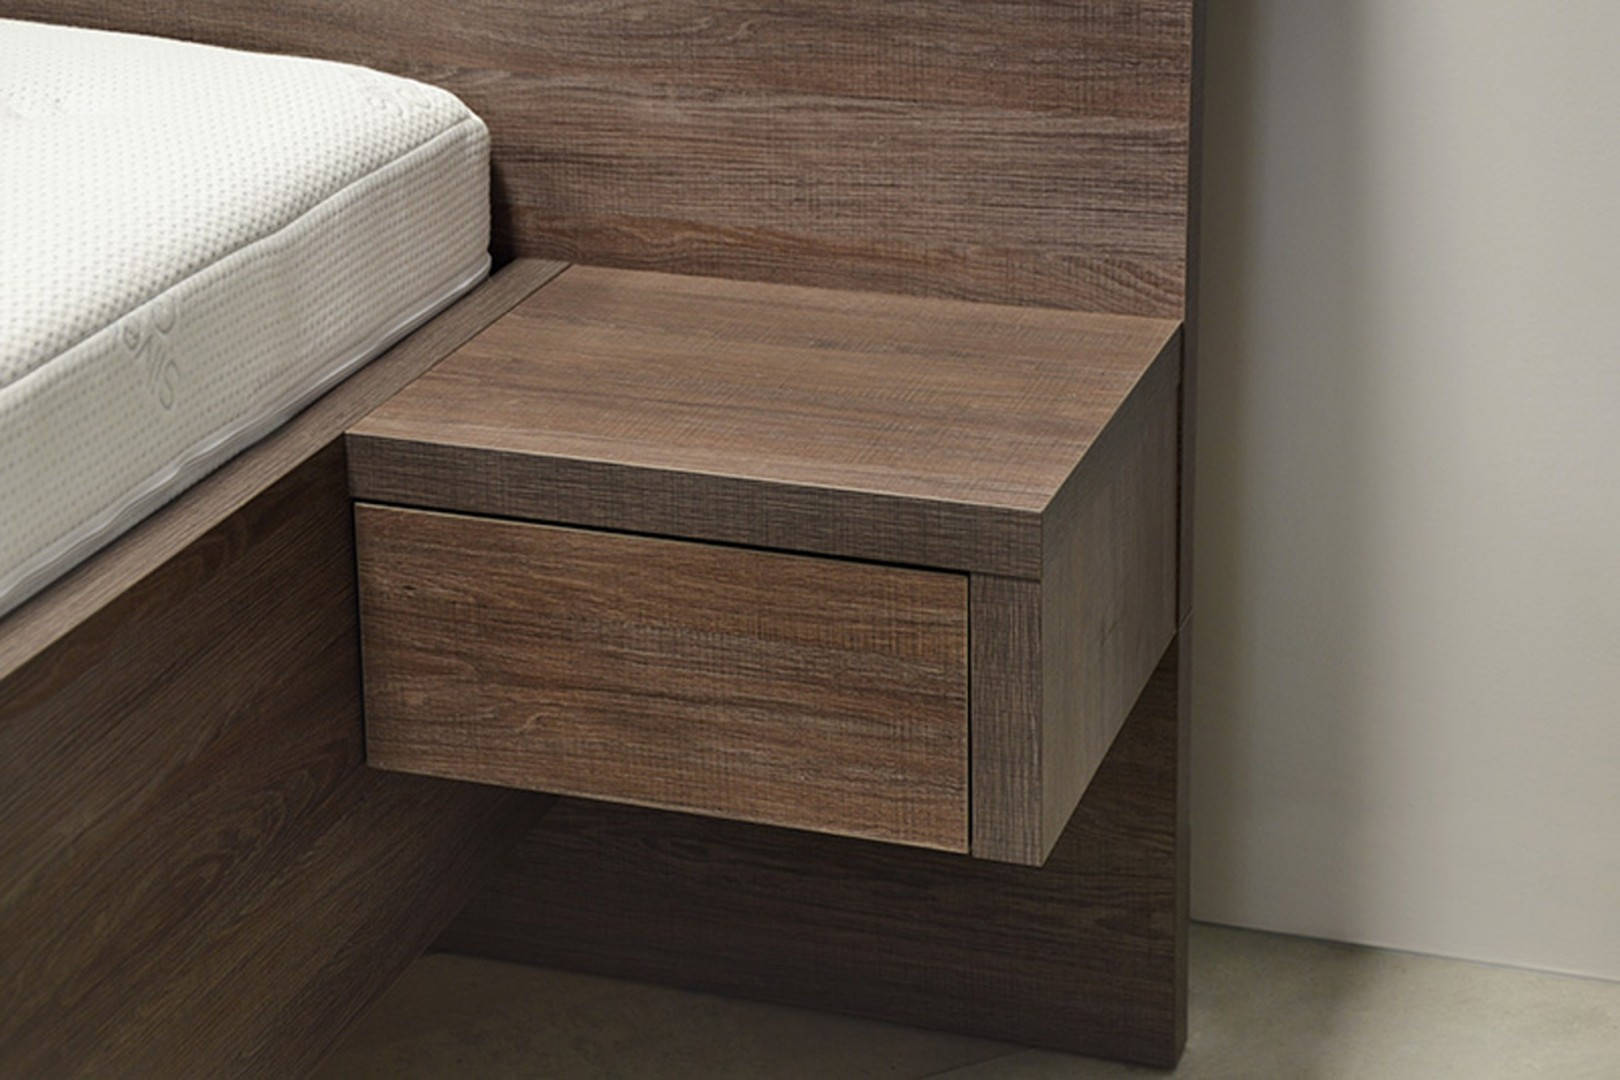 Ahorn JEDNOZÁSUVKA - noční stolek k posteli SALINA LEVÁ/PRAVÁ (dekor dub bílý)